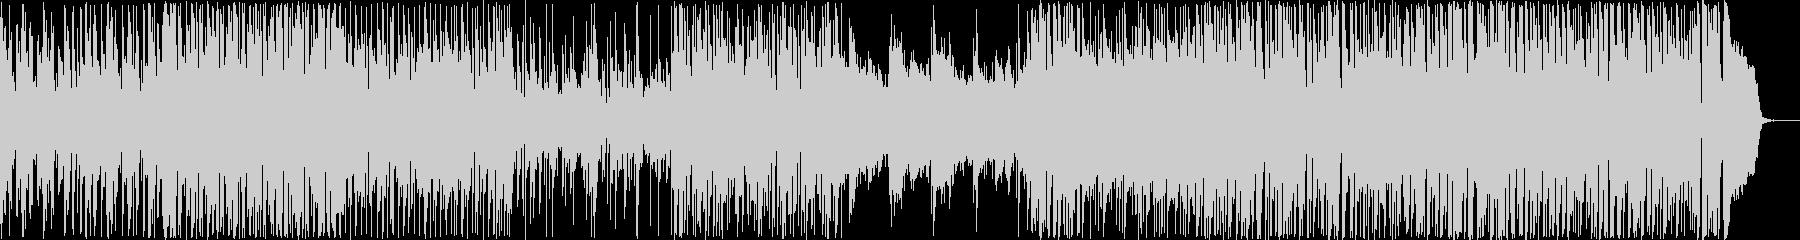 BGM_ライフワークの未再生の波形